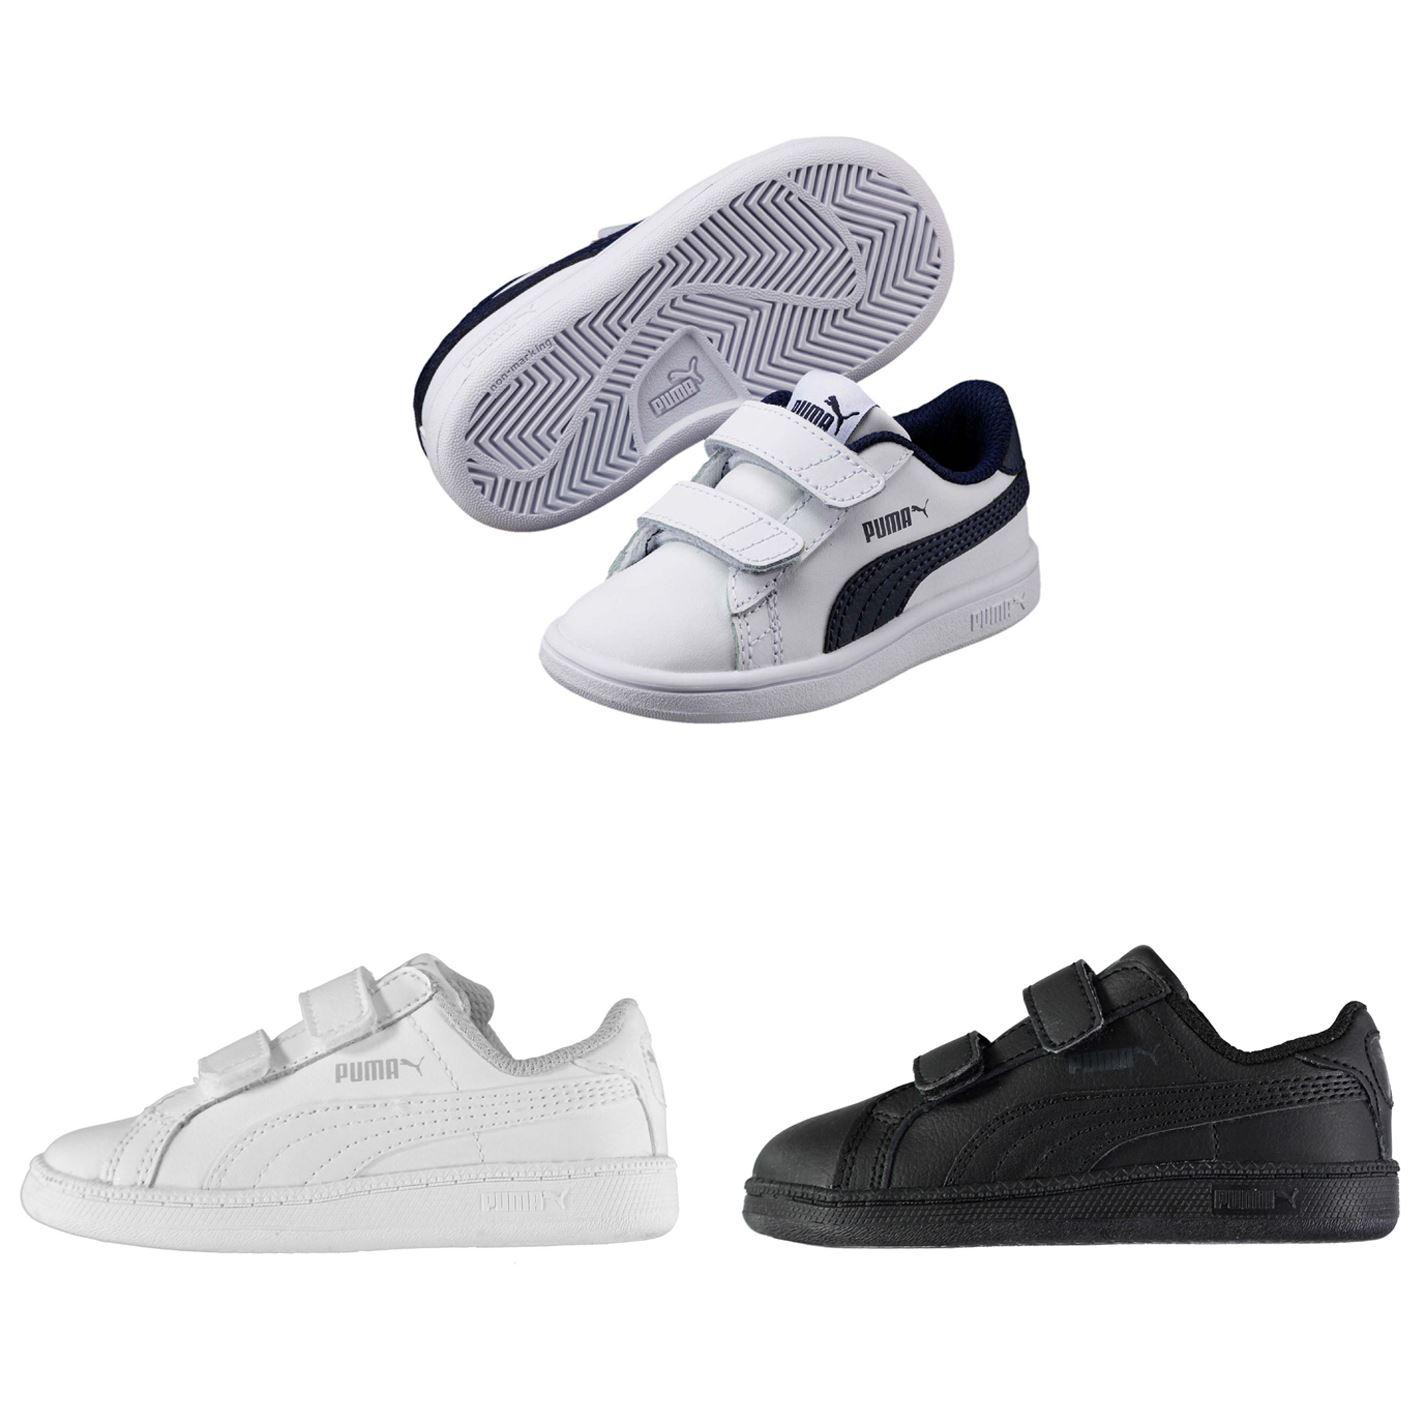 89b6a02c958b ... Puma Smash Suede Fun Court Trainers Infant Boys Shoes Footwear ...